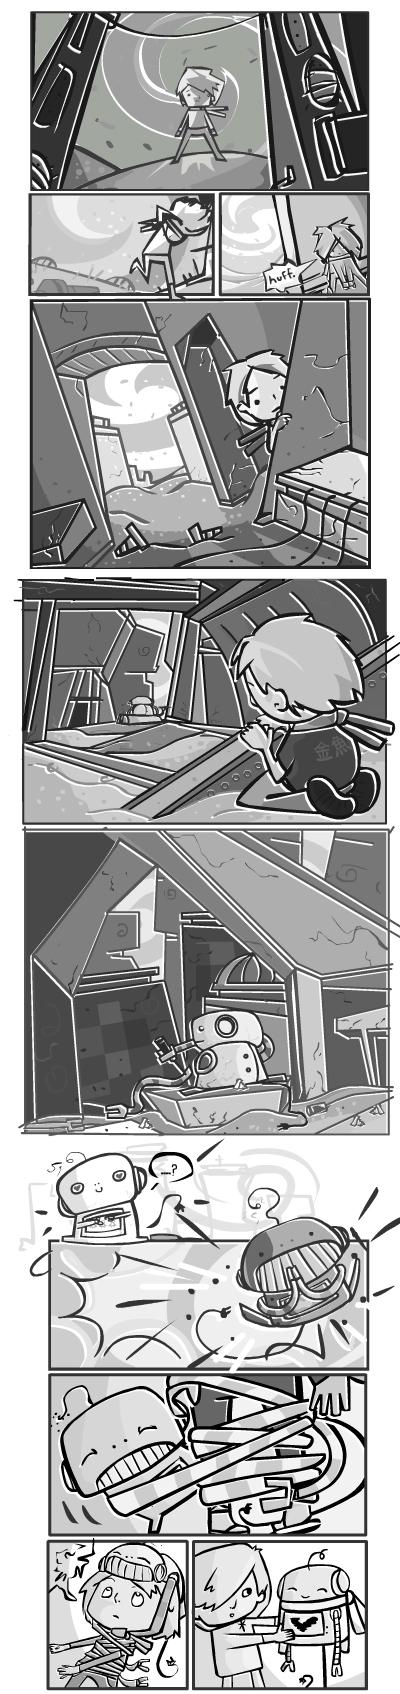 we are friend : mini comic 3 by RayArray